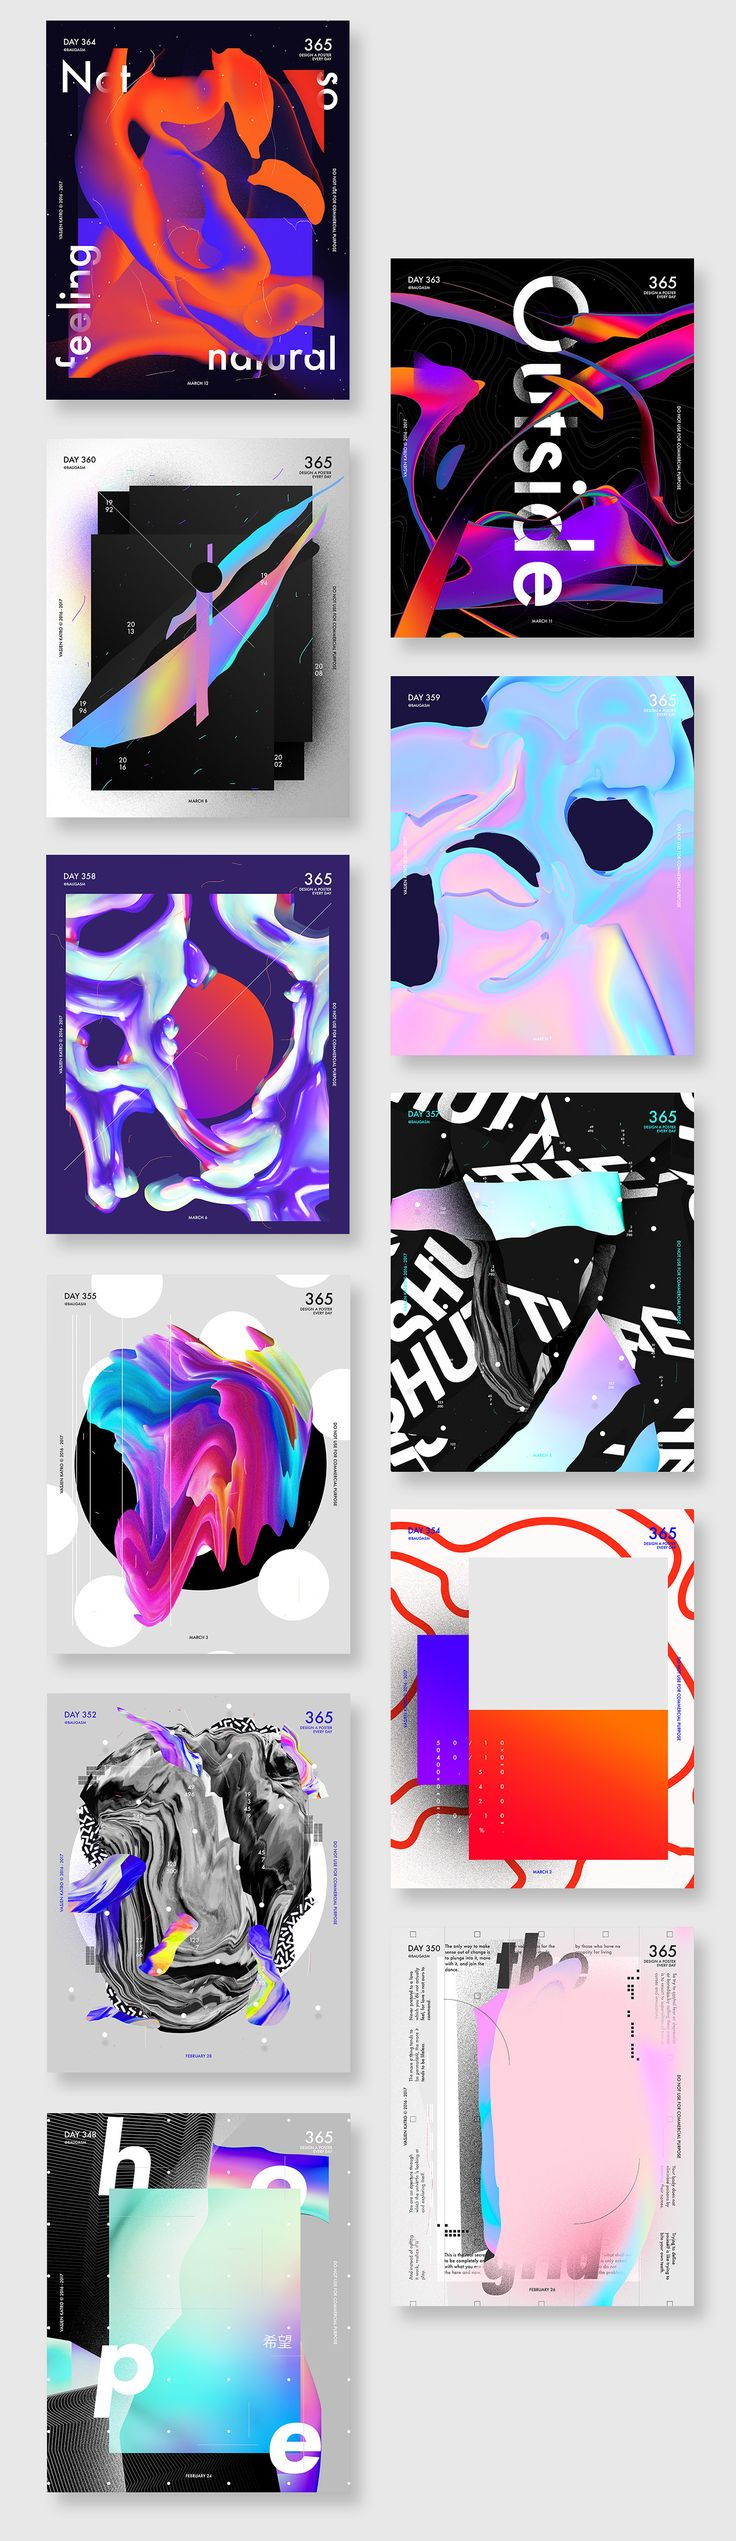 https://www.behance.net/gallery/50411735/Baugasm-365-Posters